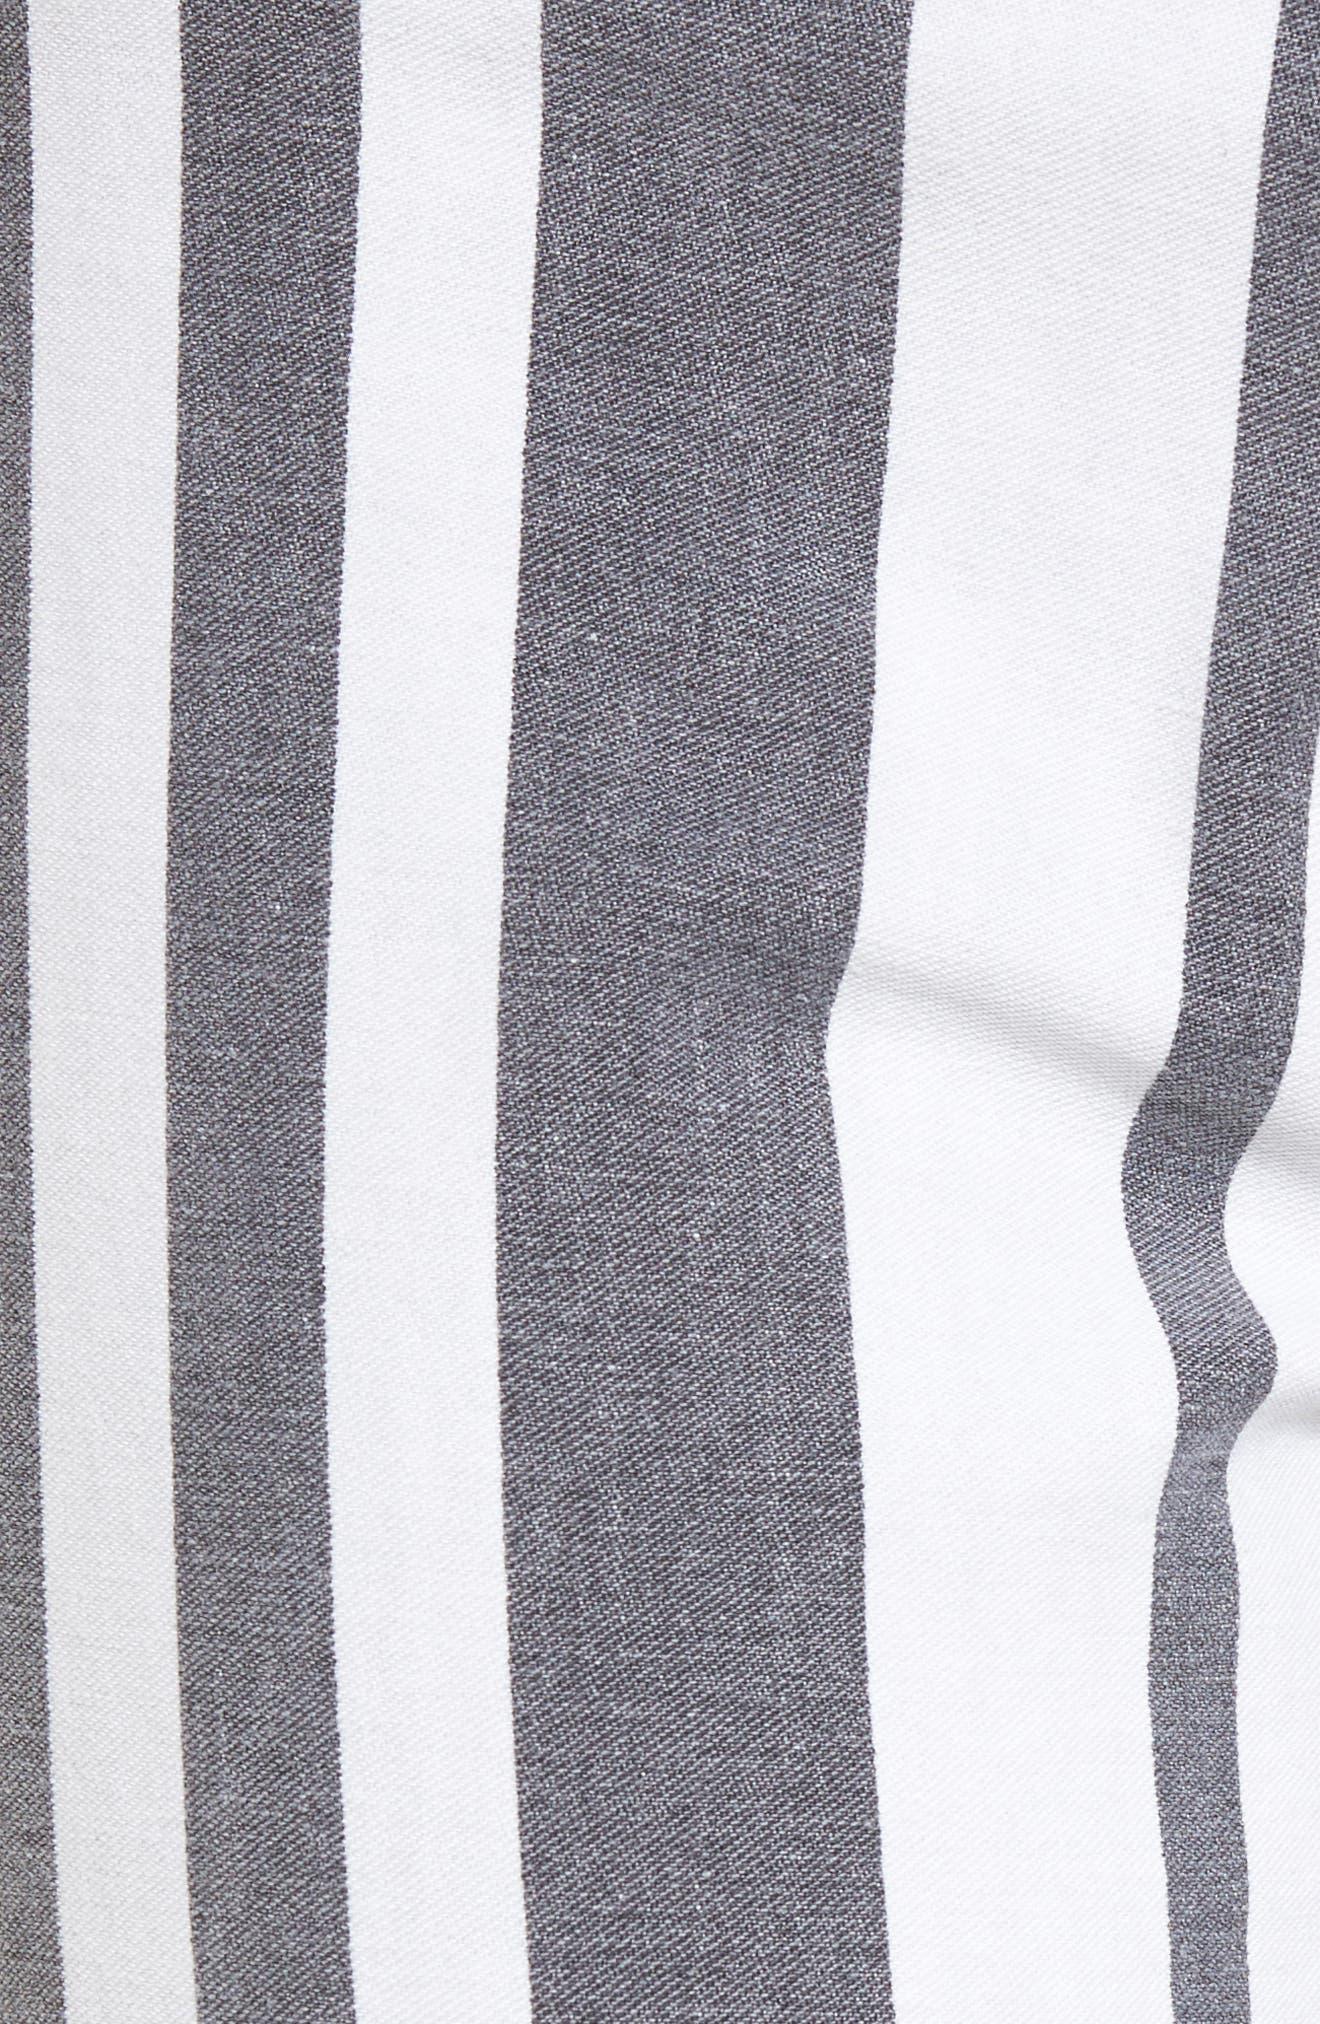 Barbara High Waist Ankle Super Skinny Jeans,                             Alternate thumbnail 5, color,                             461